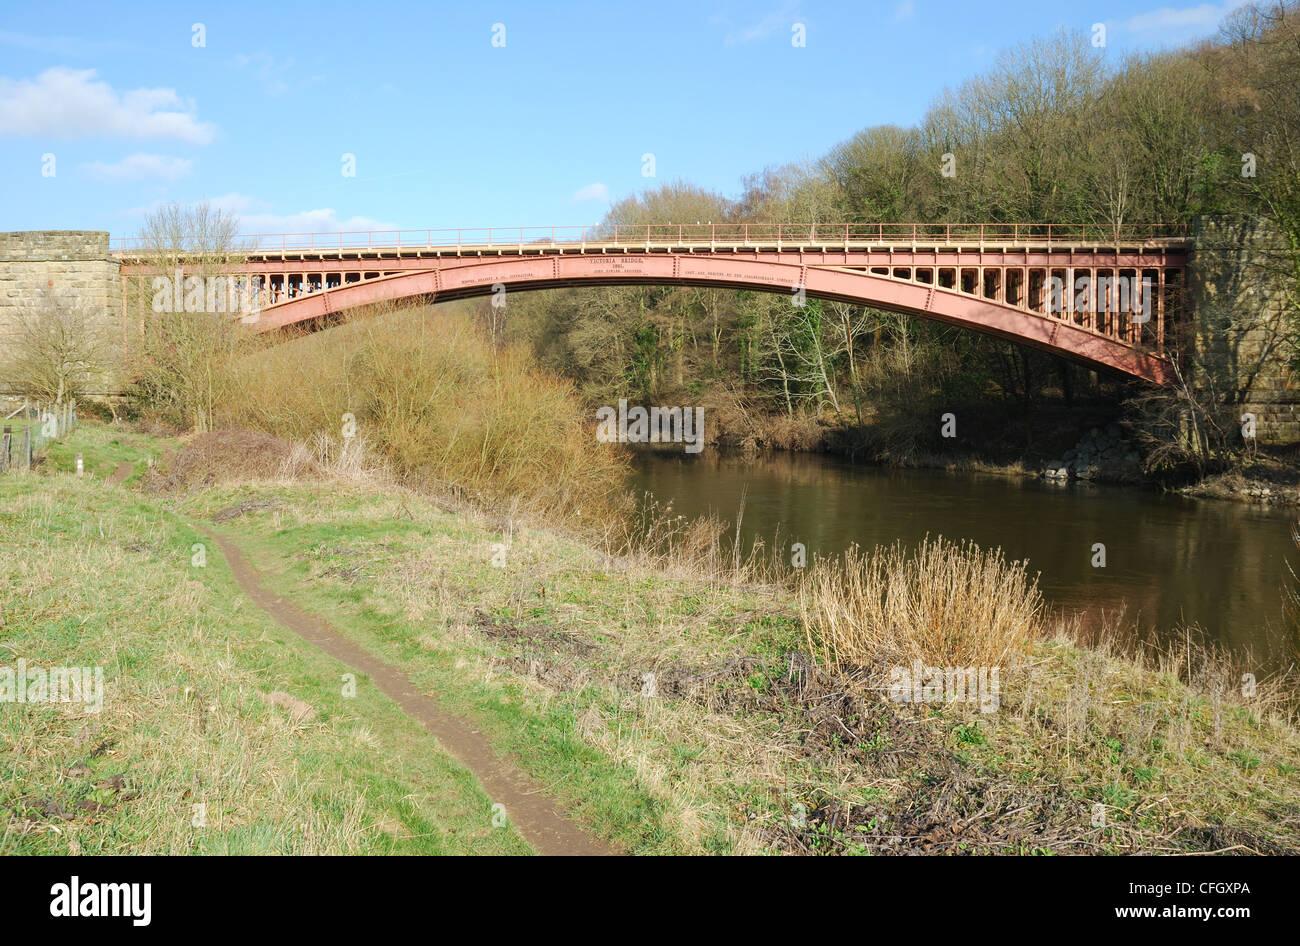 Victoria Bridge over the River Severn, Severn Valley Railway, Upper Arley, Worcestershire, UK Stock Photo